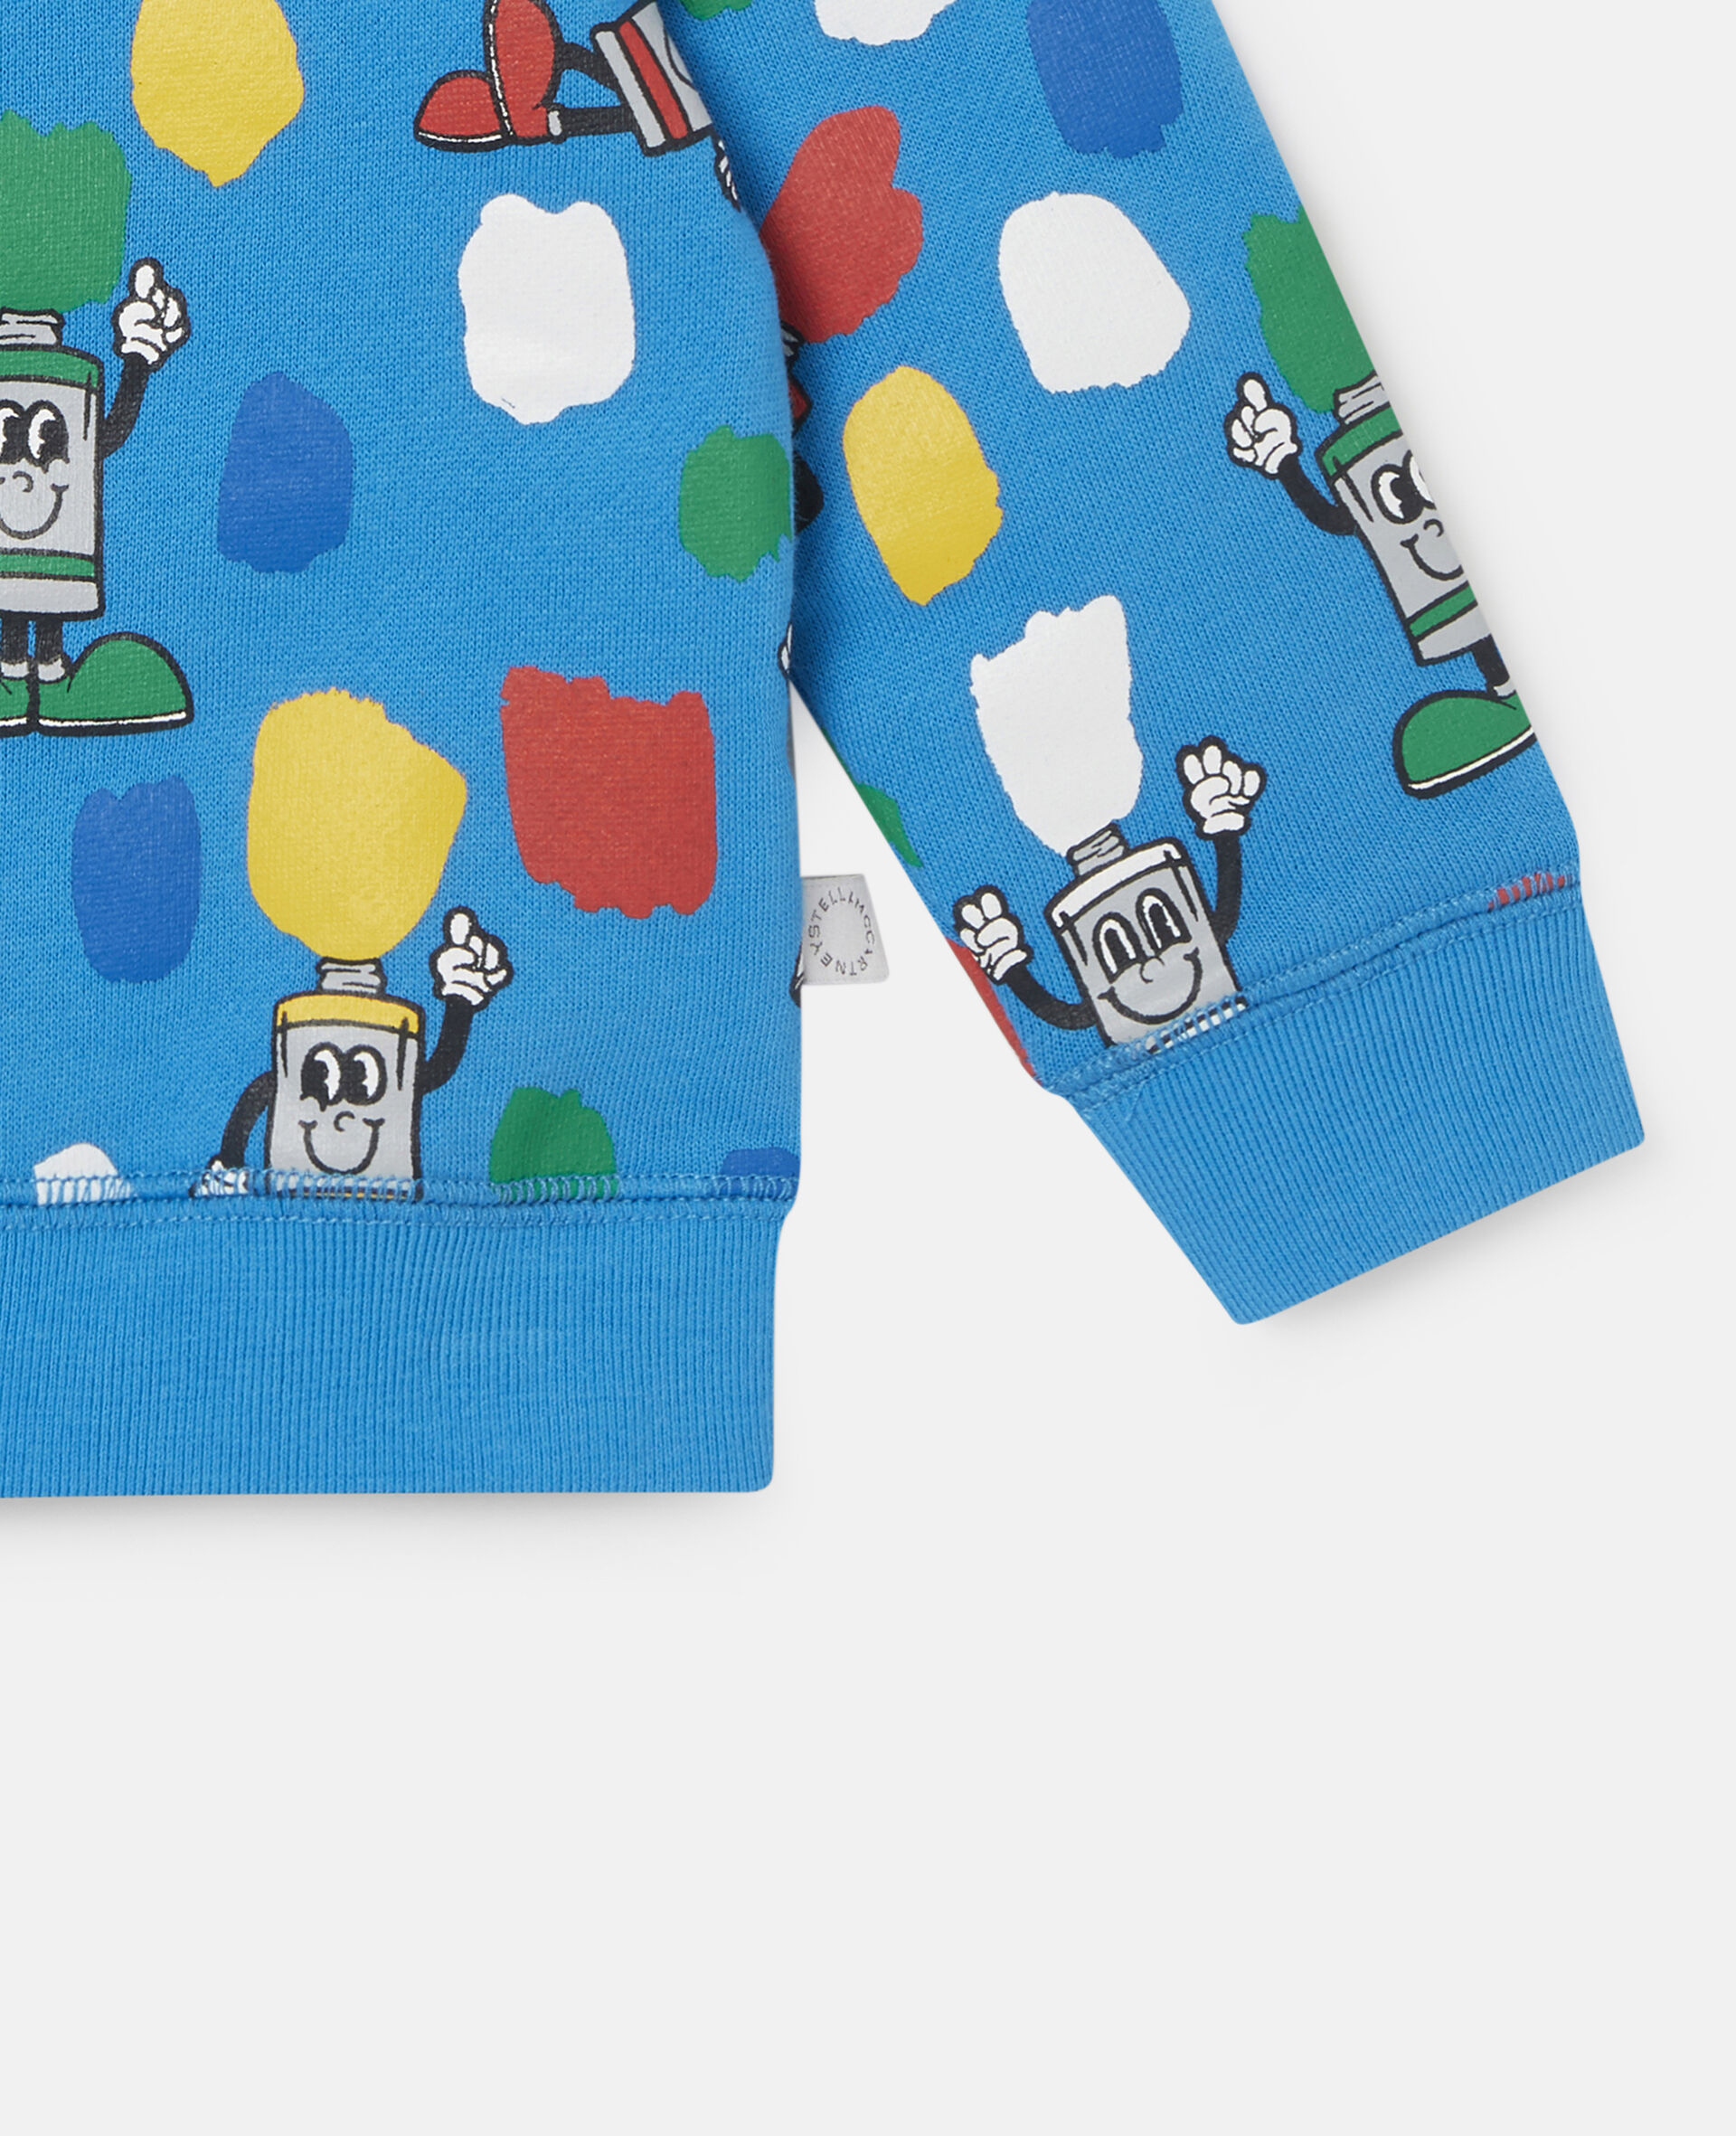 Paint Tubes Fleece Sweatshirt-Blue-large image number 2